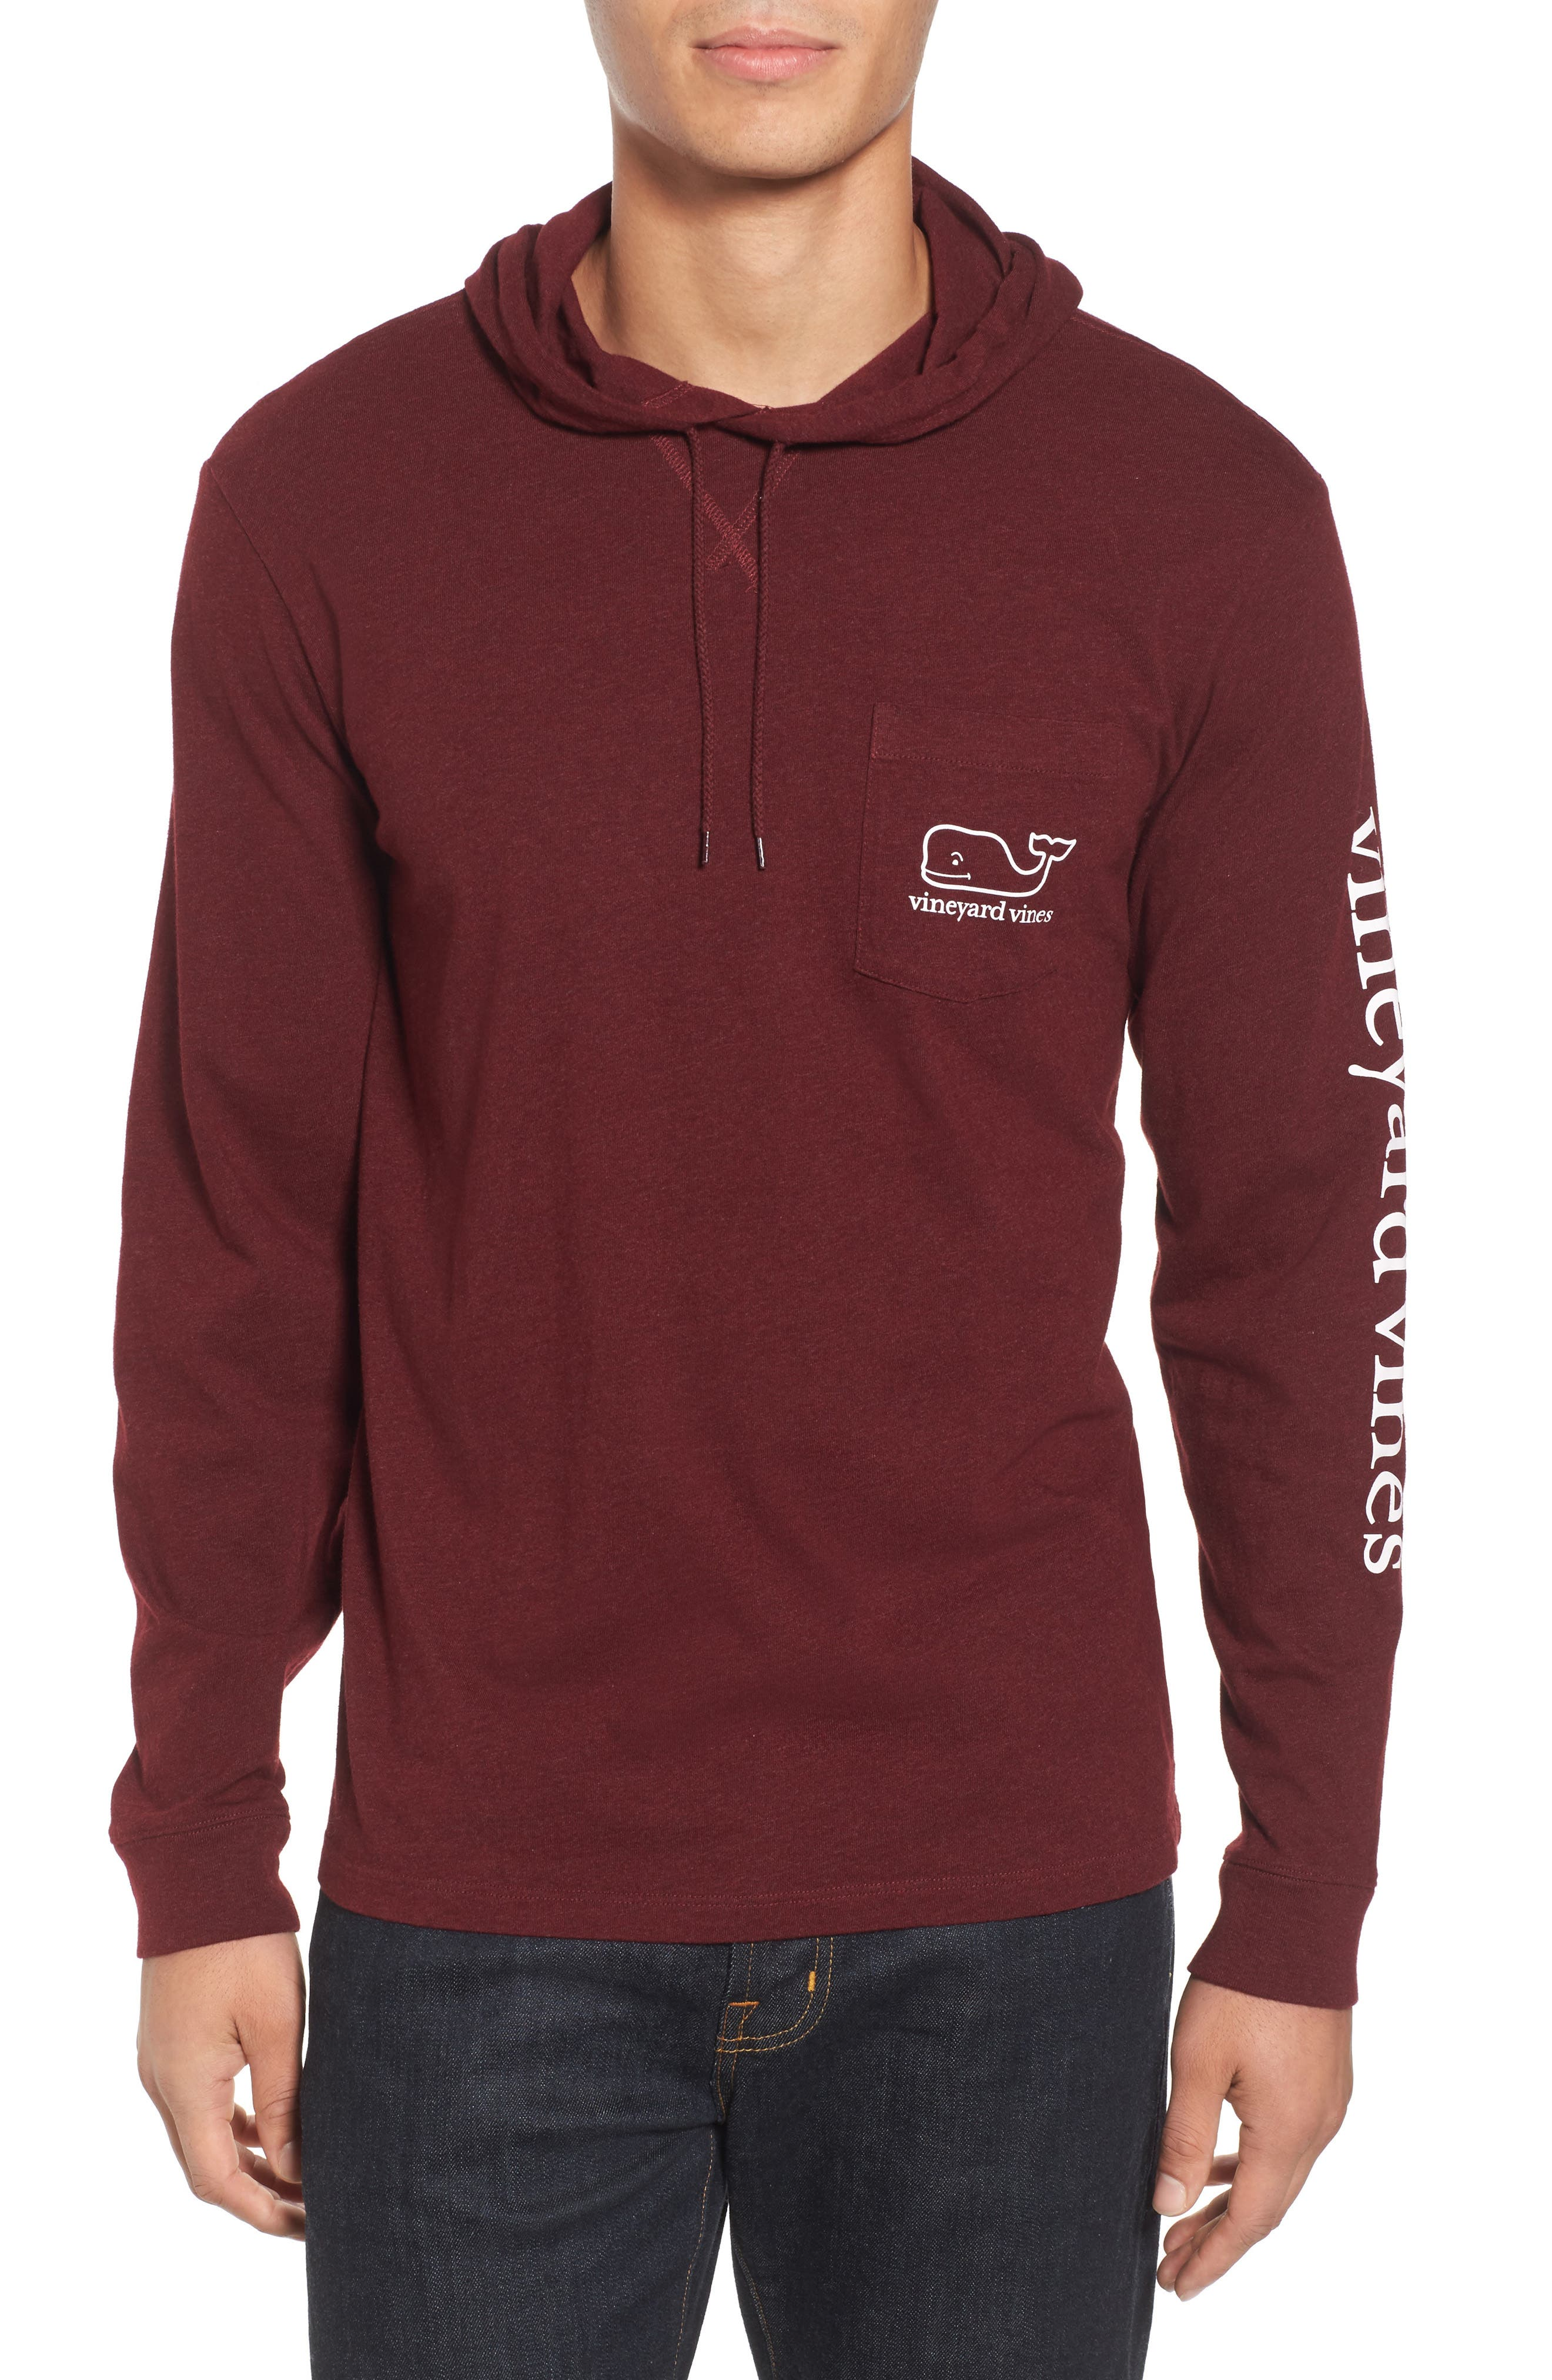 Main Image - vineyard vines Long Sleeve Hooded T-Shirt